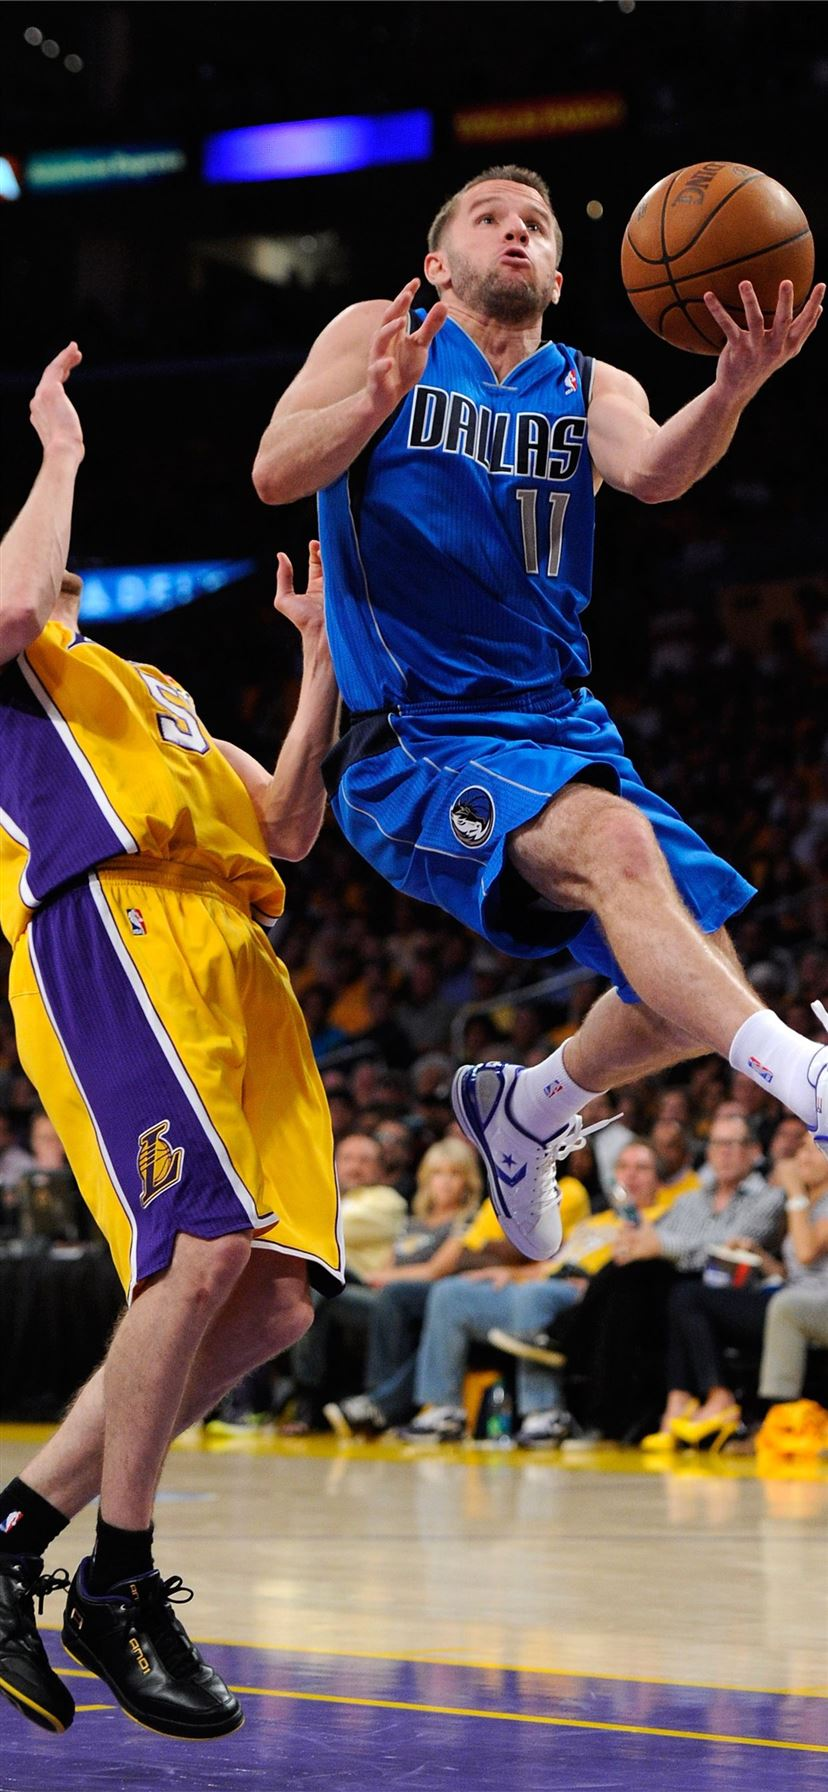 Nba Basketball Los Angeles Lakers Athletes Dallas Iphone 11